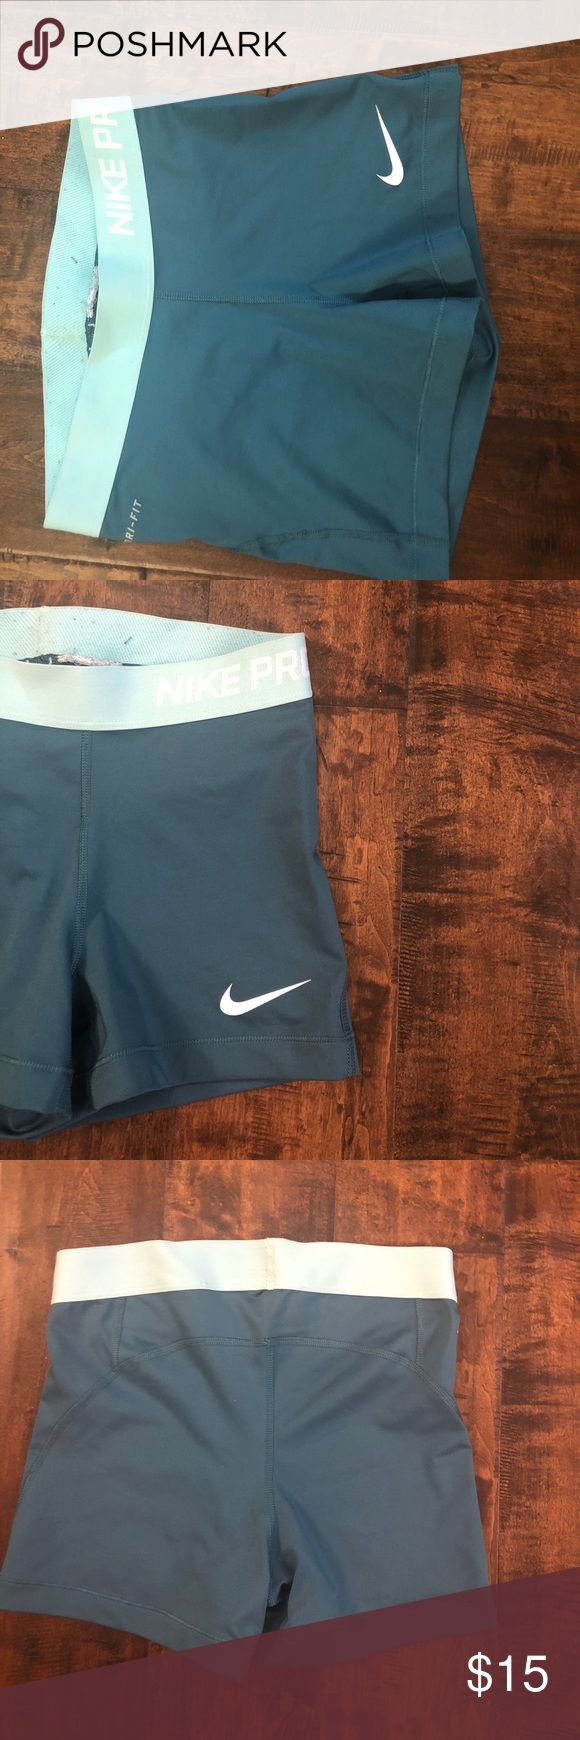 Teal, turquoise Nike compression shorts Super cute teal and turquoise say small Nike compression shorts Nike Shorts